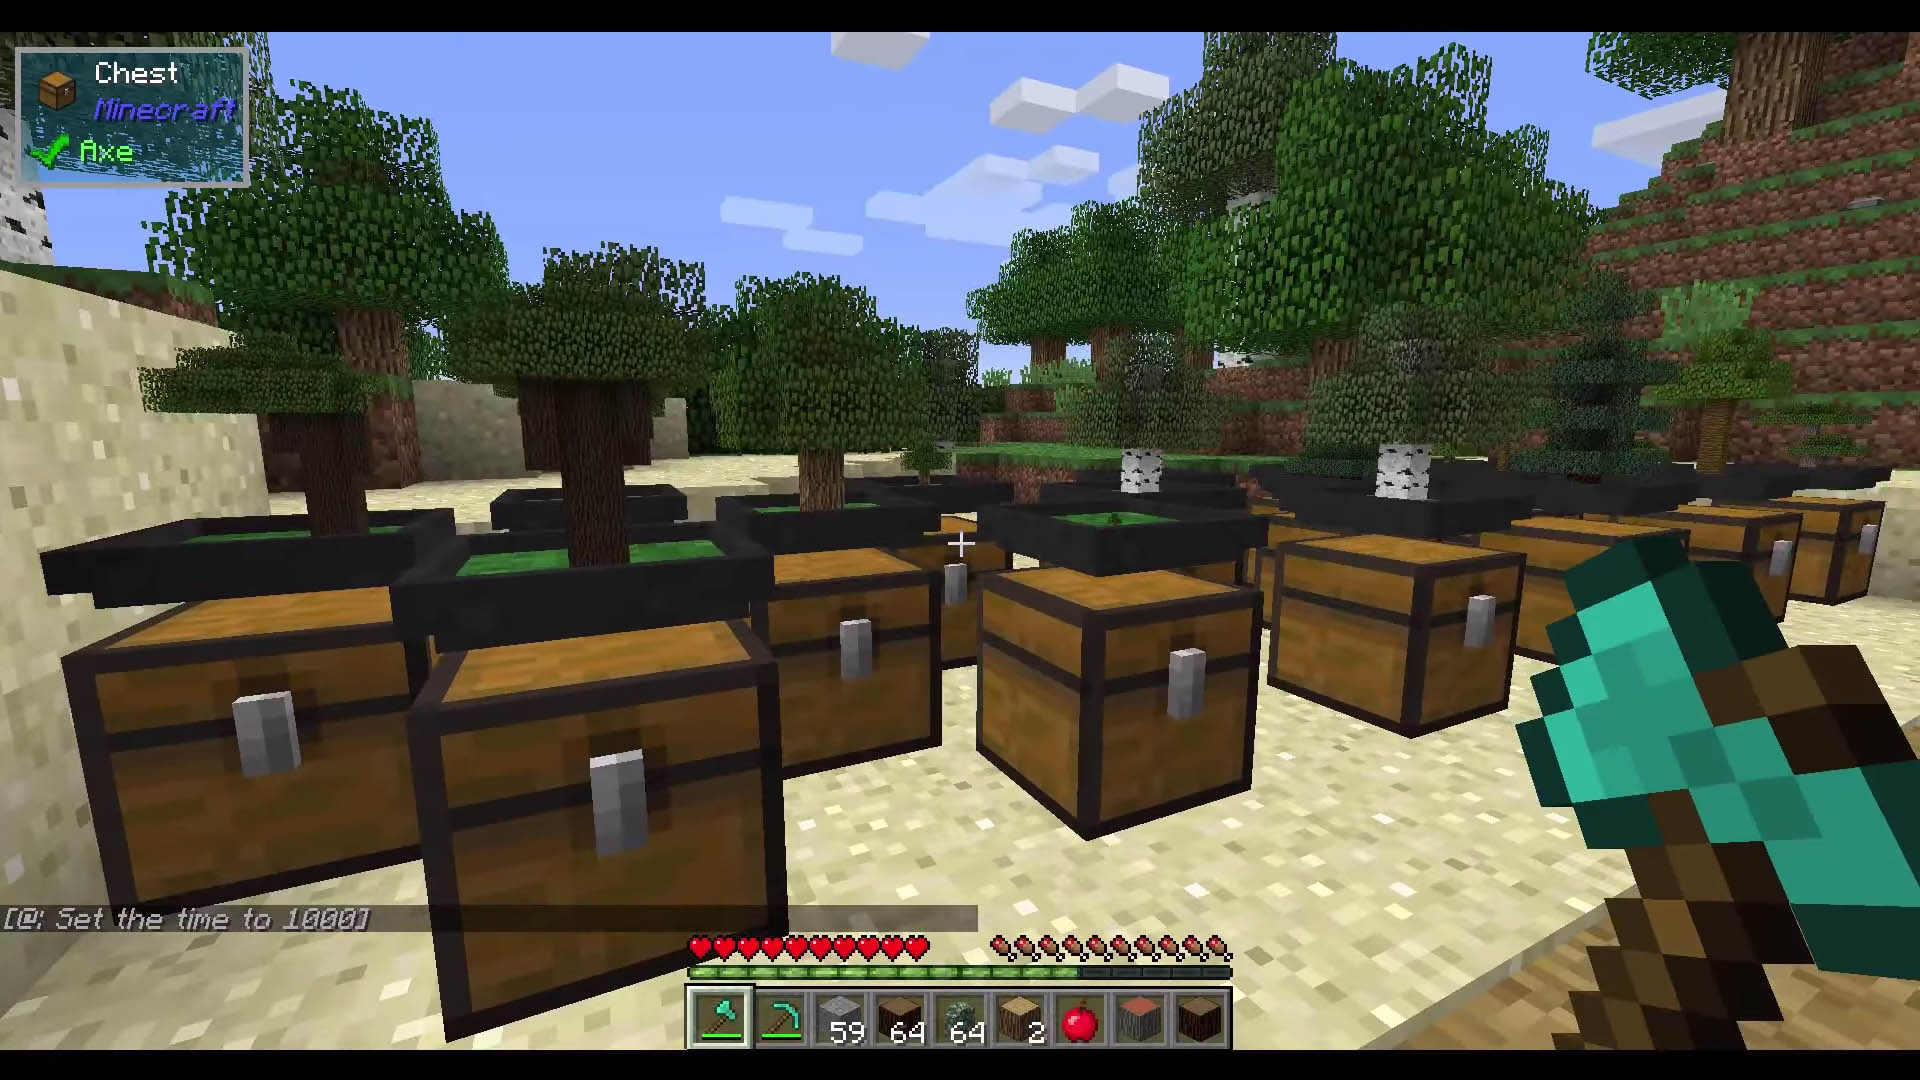 Bonsai Trees 2 Mod 1.12.2/1.14.4/1.15.2 - Minecraft Mods